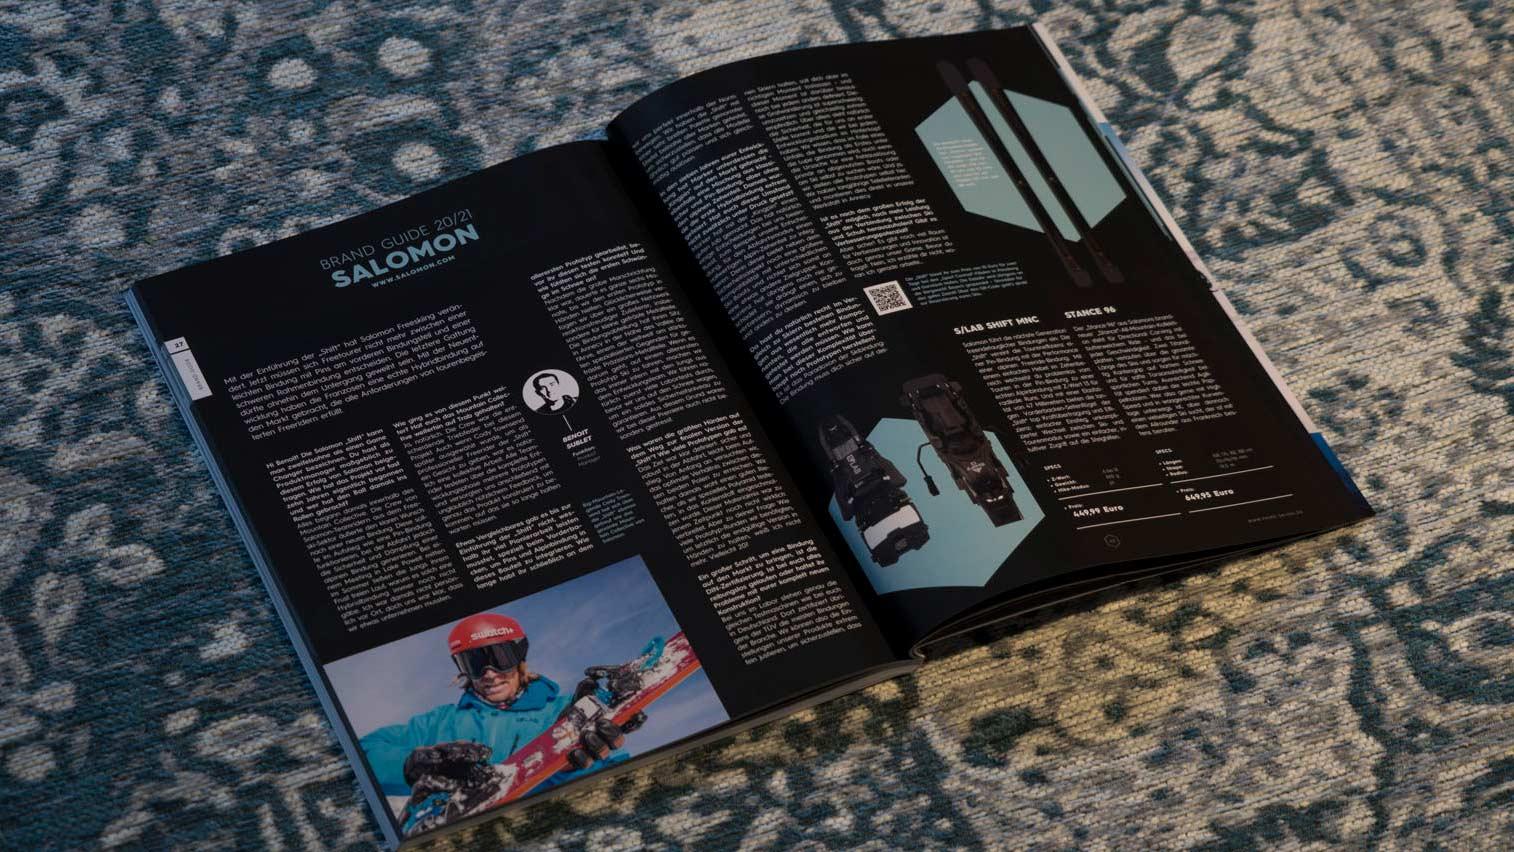 Salomon in der PRIME Skiing Brandguide 2021 Printausgabe